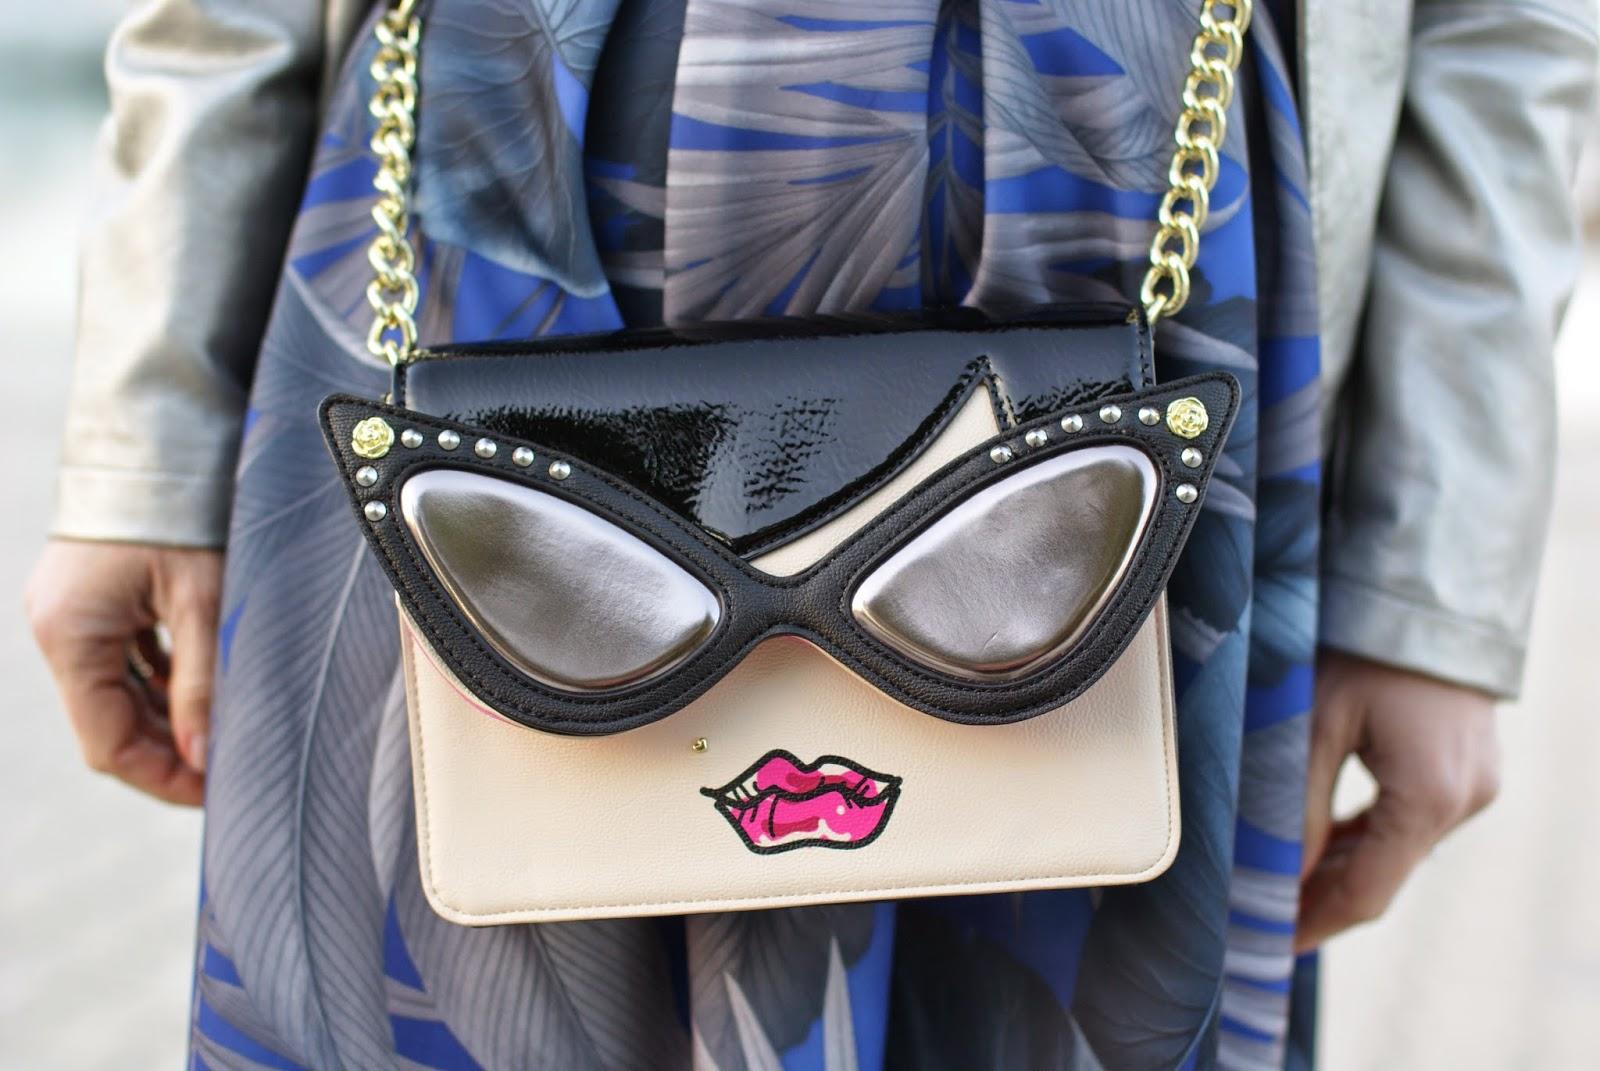 Betsey Johnson face bag, Betsey Johnson sunglasses bag, Fashion and Cookies fashion blog, fashion blogger